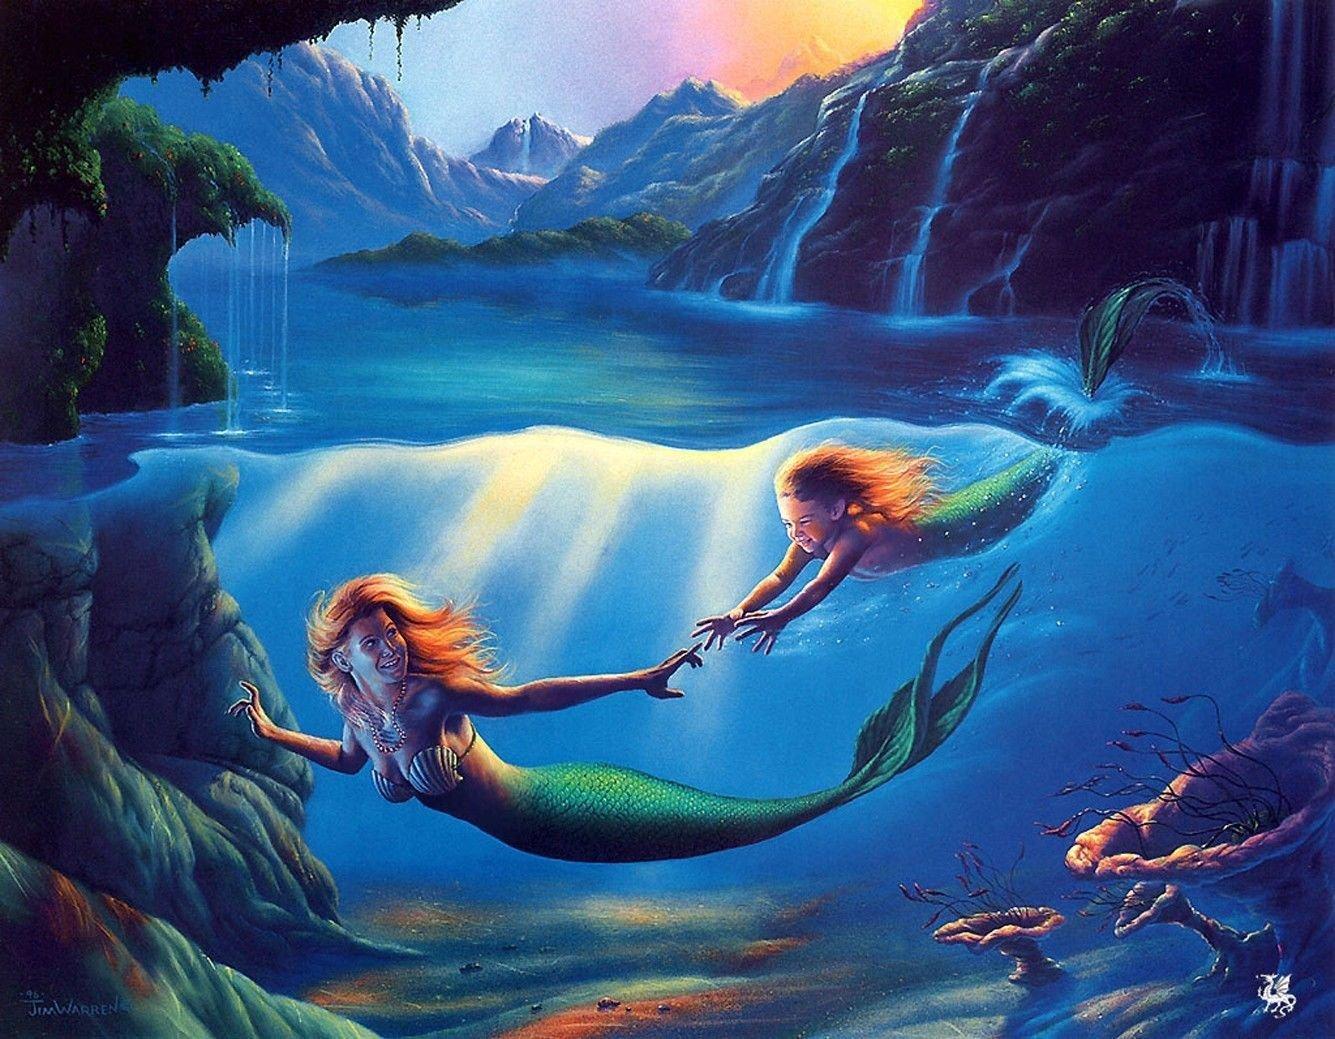 Mermaid Oil Art 32x24 Poster Decor